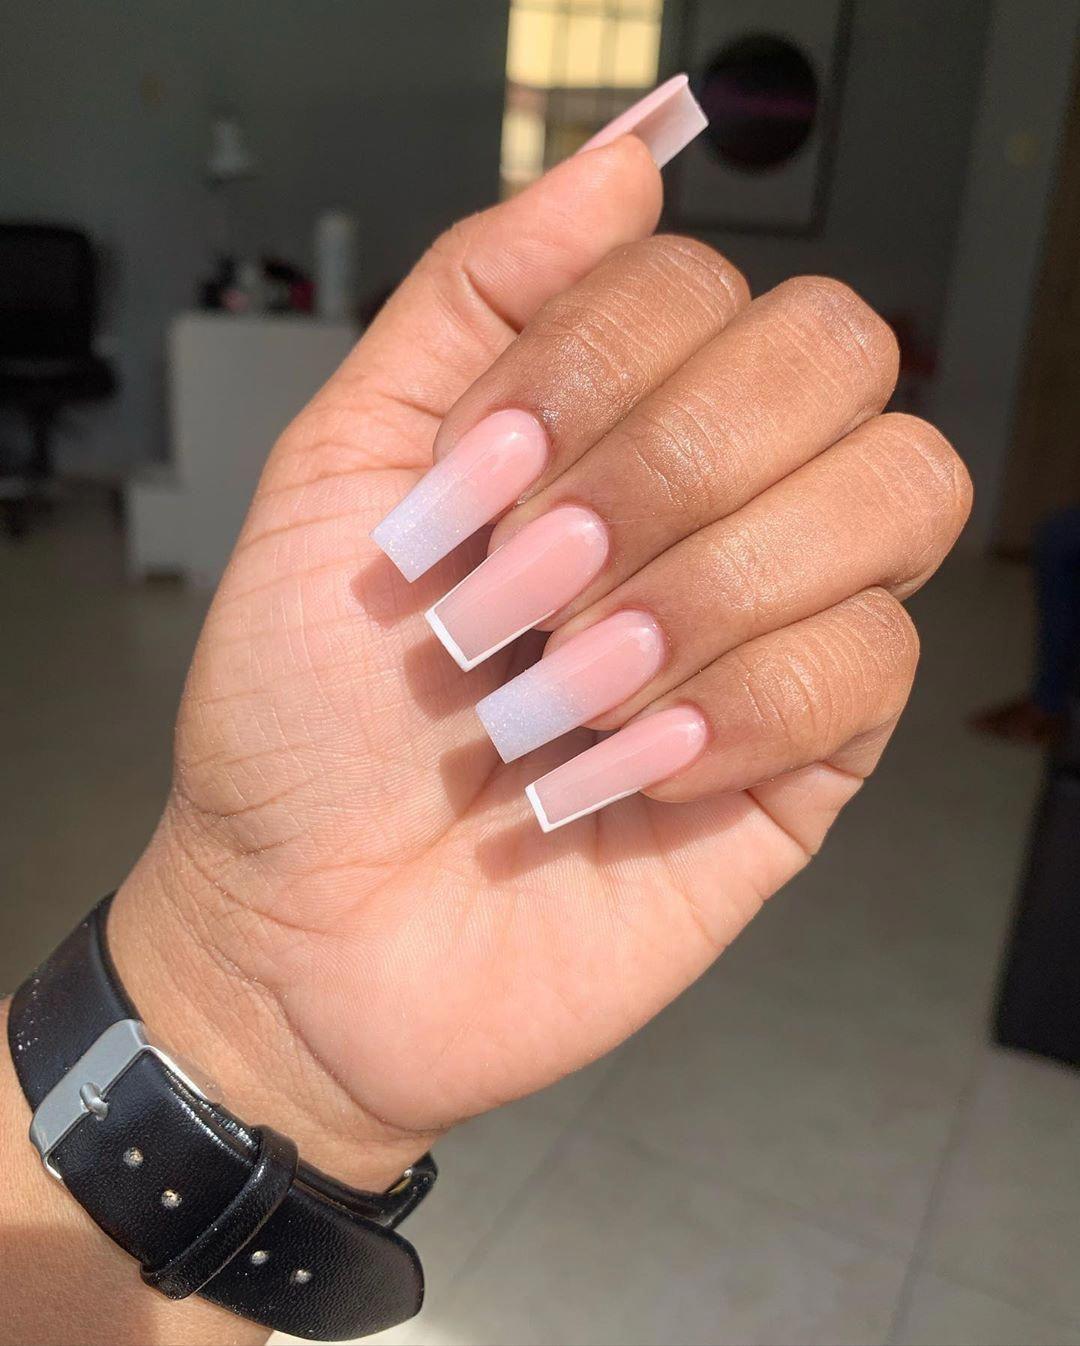 Long Square Acrylic Nails : square, acrylic, nails, Acrylic, #squareacrylicnails, Square, Nails,, Nails